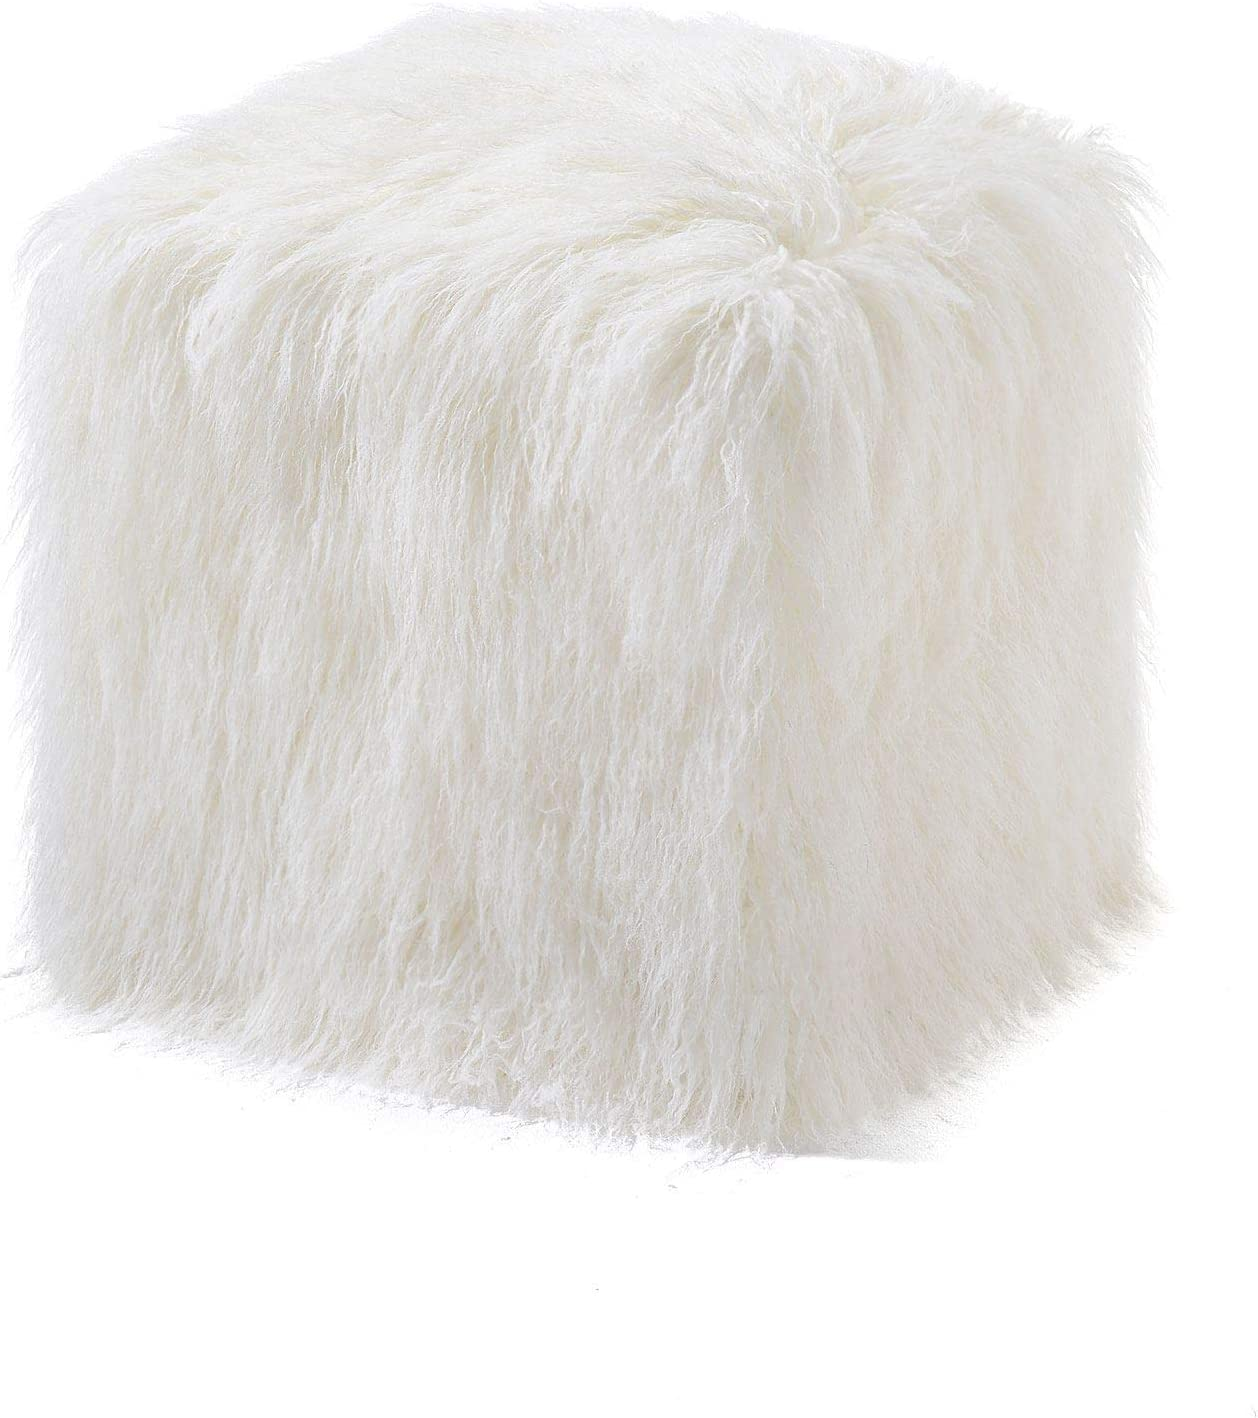 Ivory Tibetan Many popular brands Lamb Faux Pouf Fur Award-winning store